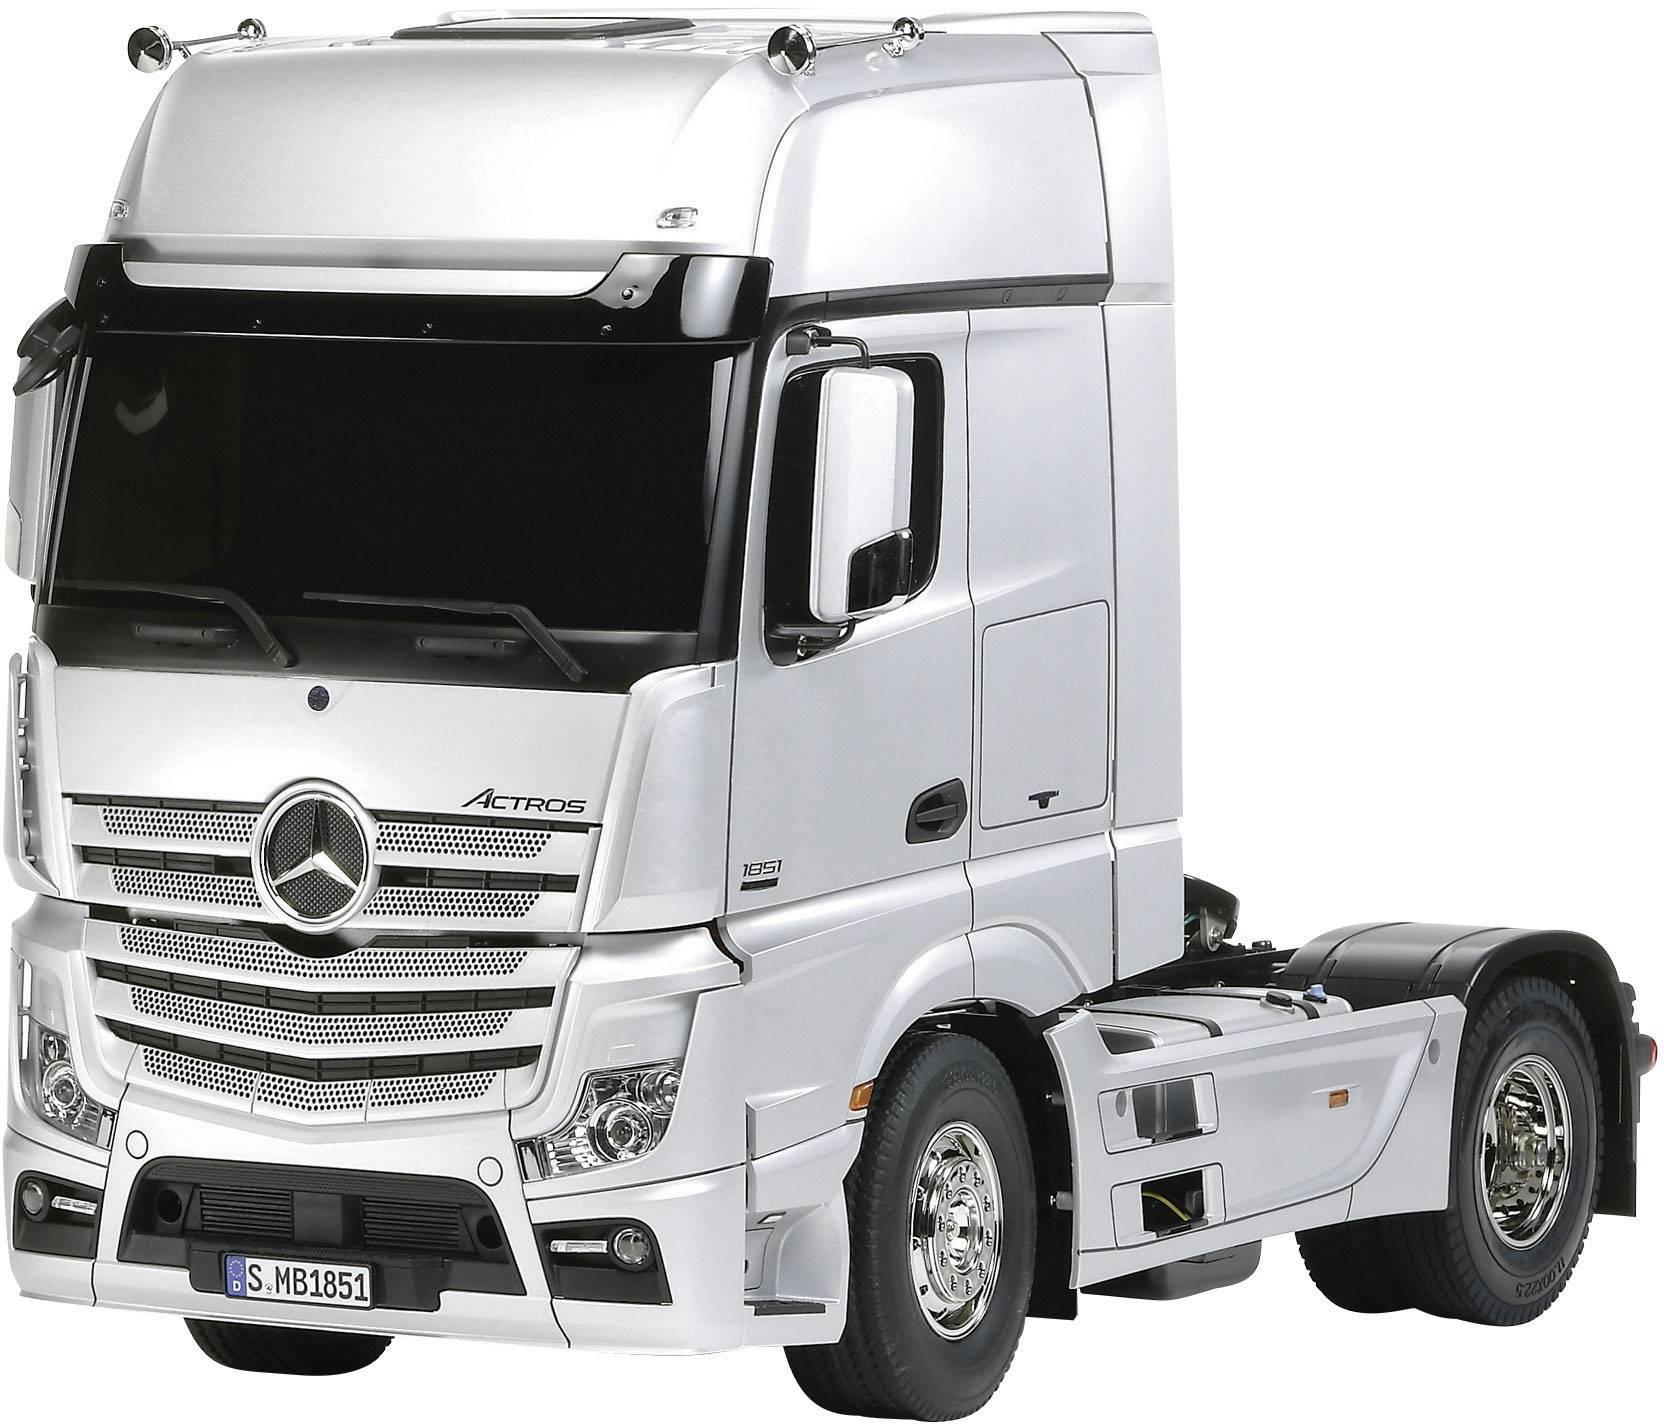 Tamiya 56335 Mercedes Benz Actros 1851 Gigaspace 1:14